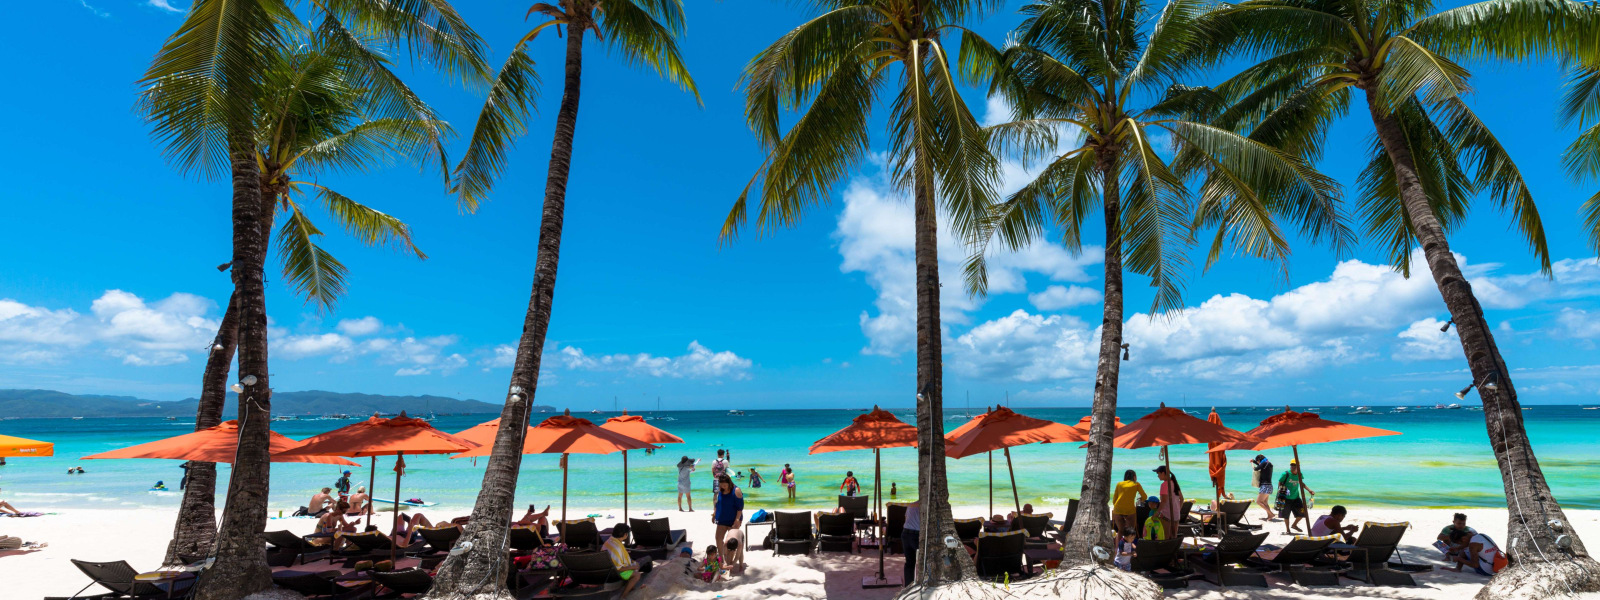 Boracay-Tour-Guide